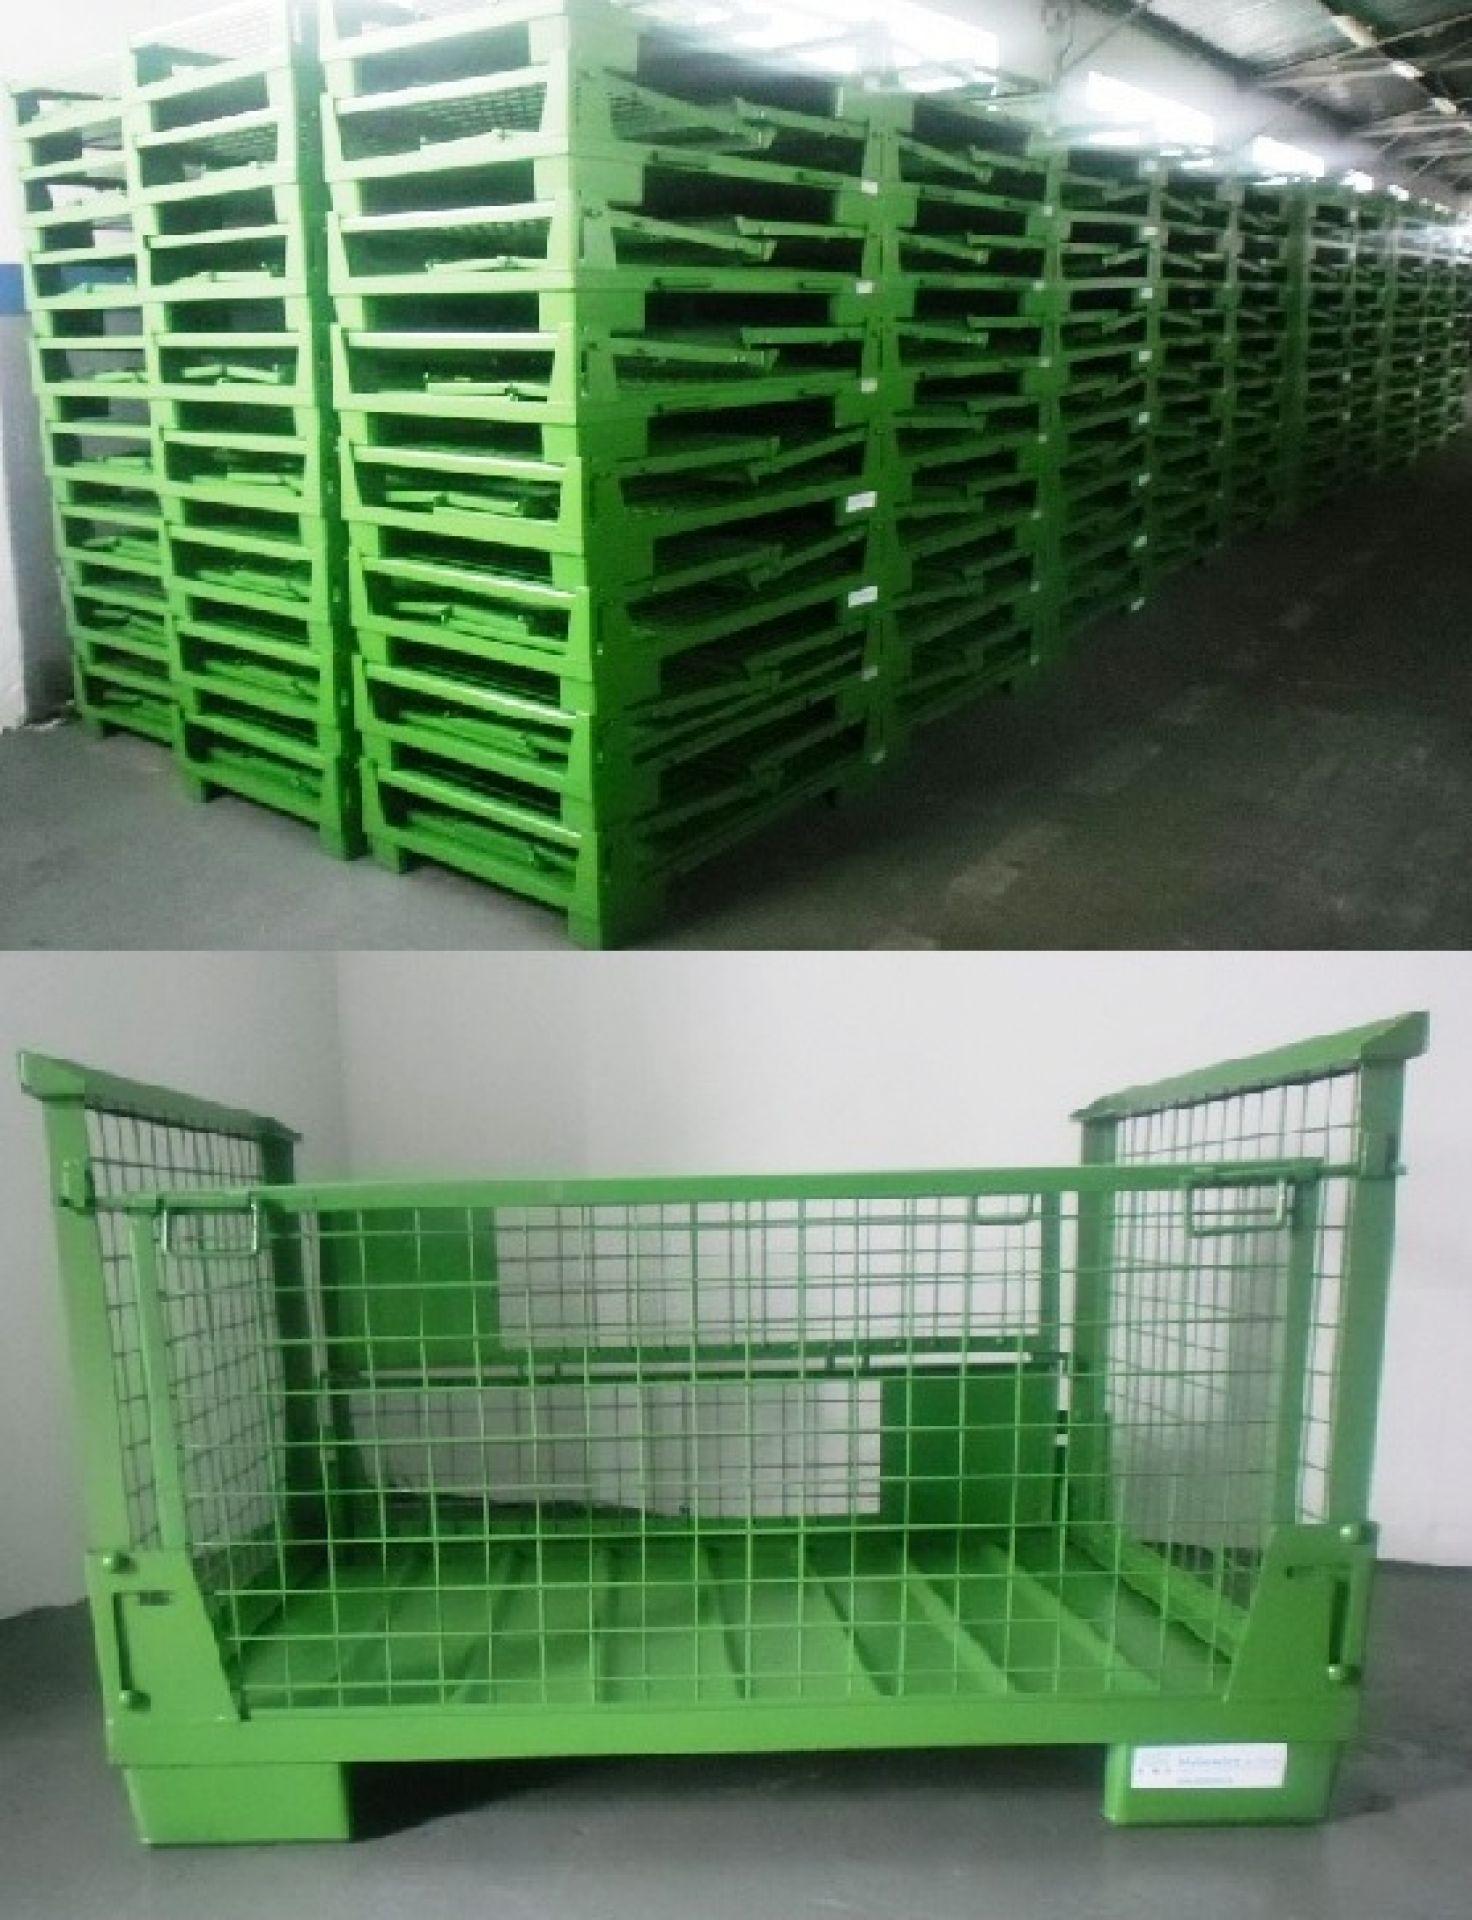 Faltbare Gitterboxen mit halber Klappe